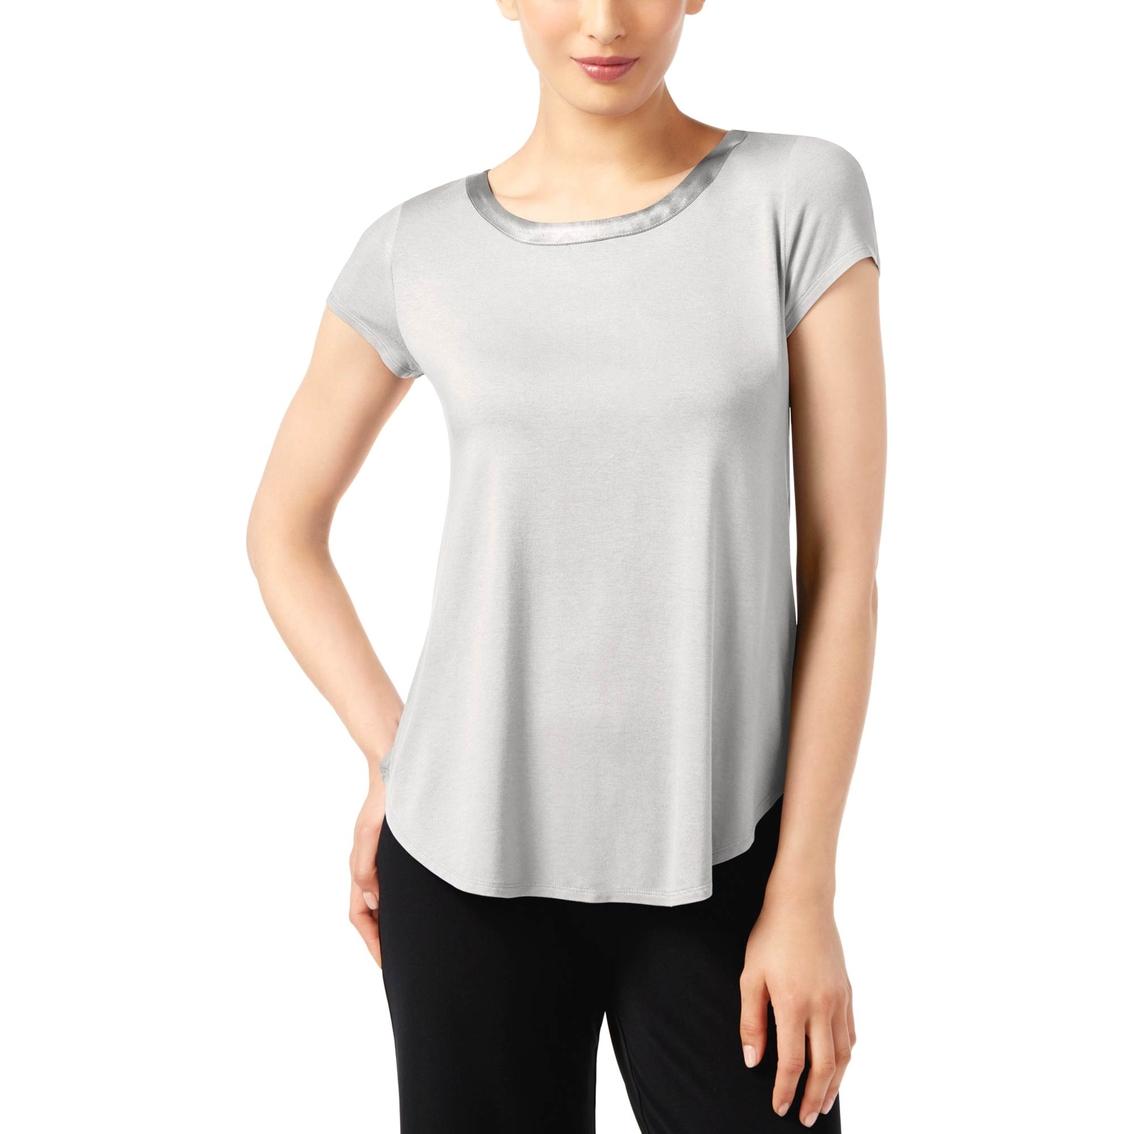 57a274ab Alfani Petite Satin Trim High Low Tee | T-shirts | Apparel | Shop ...